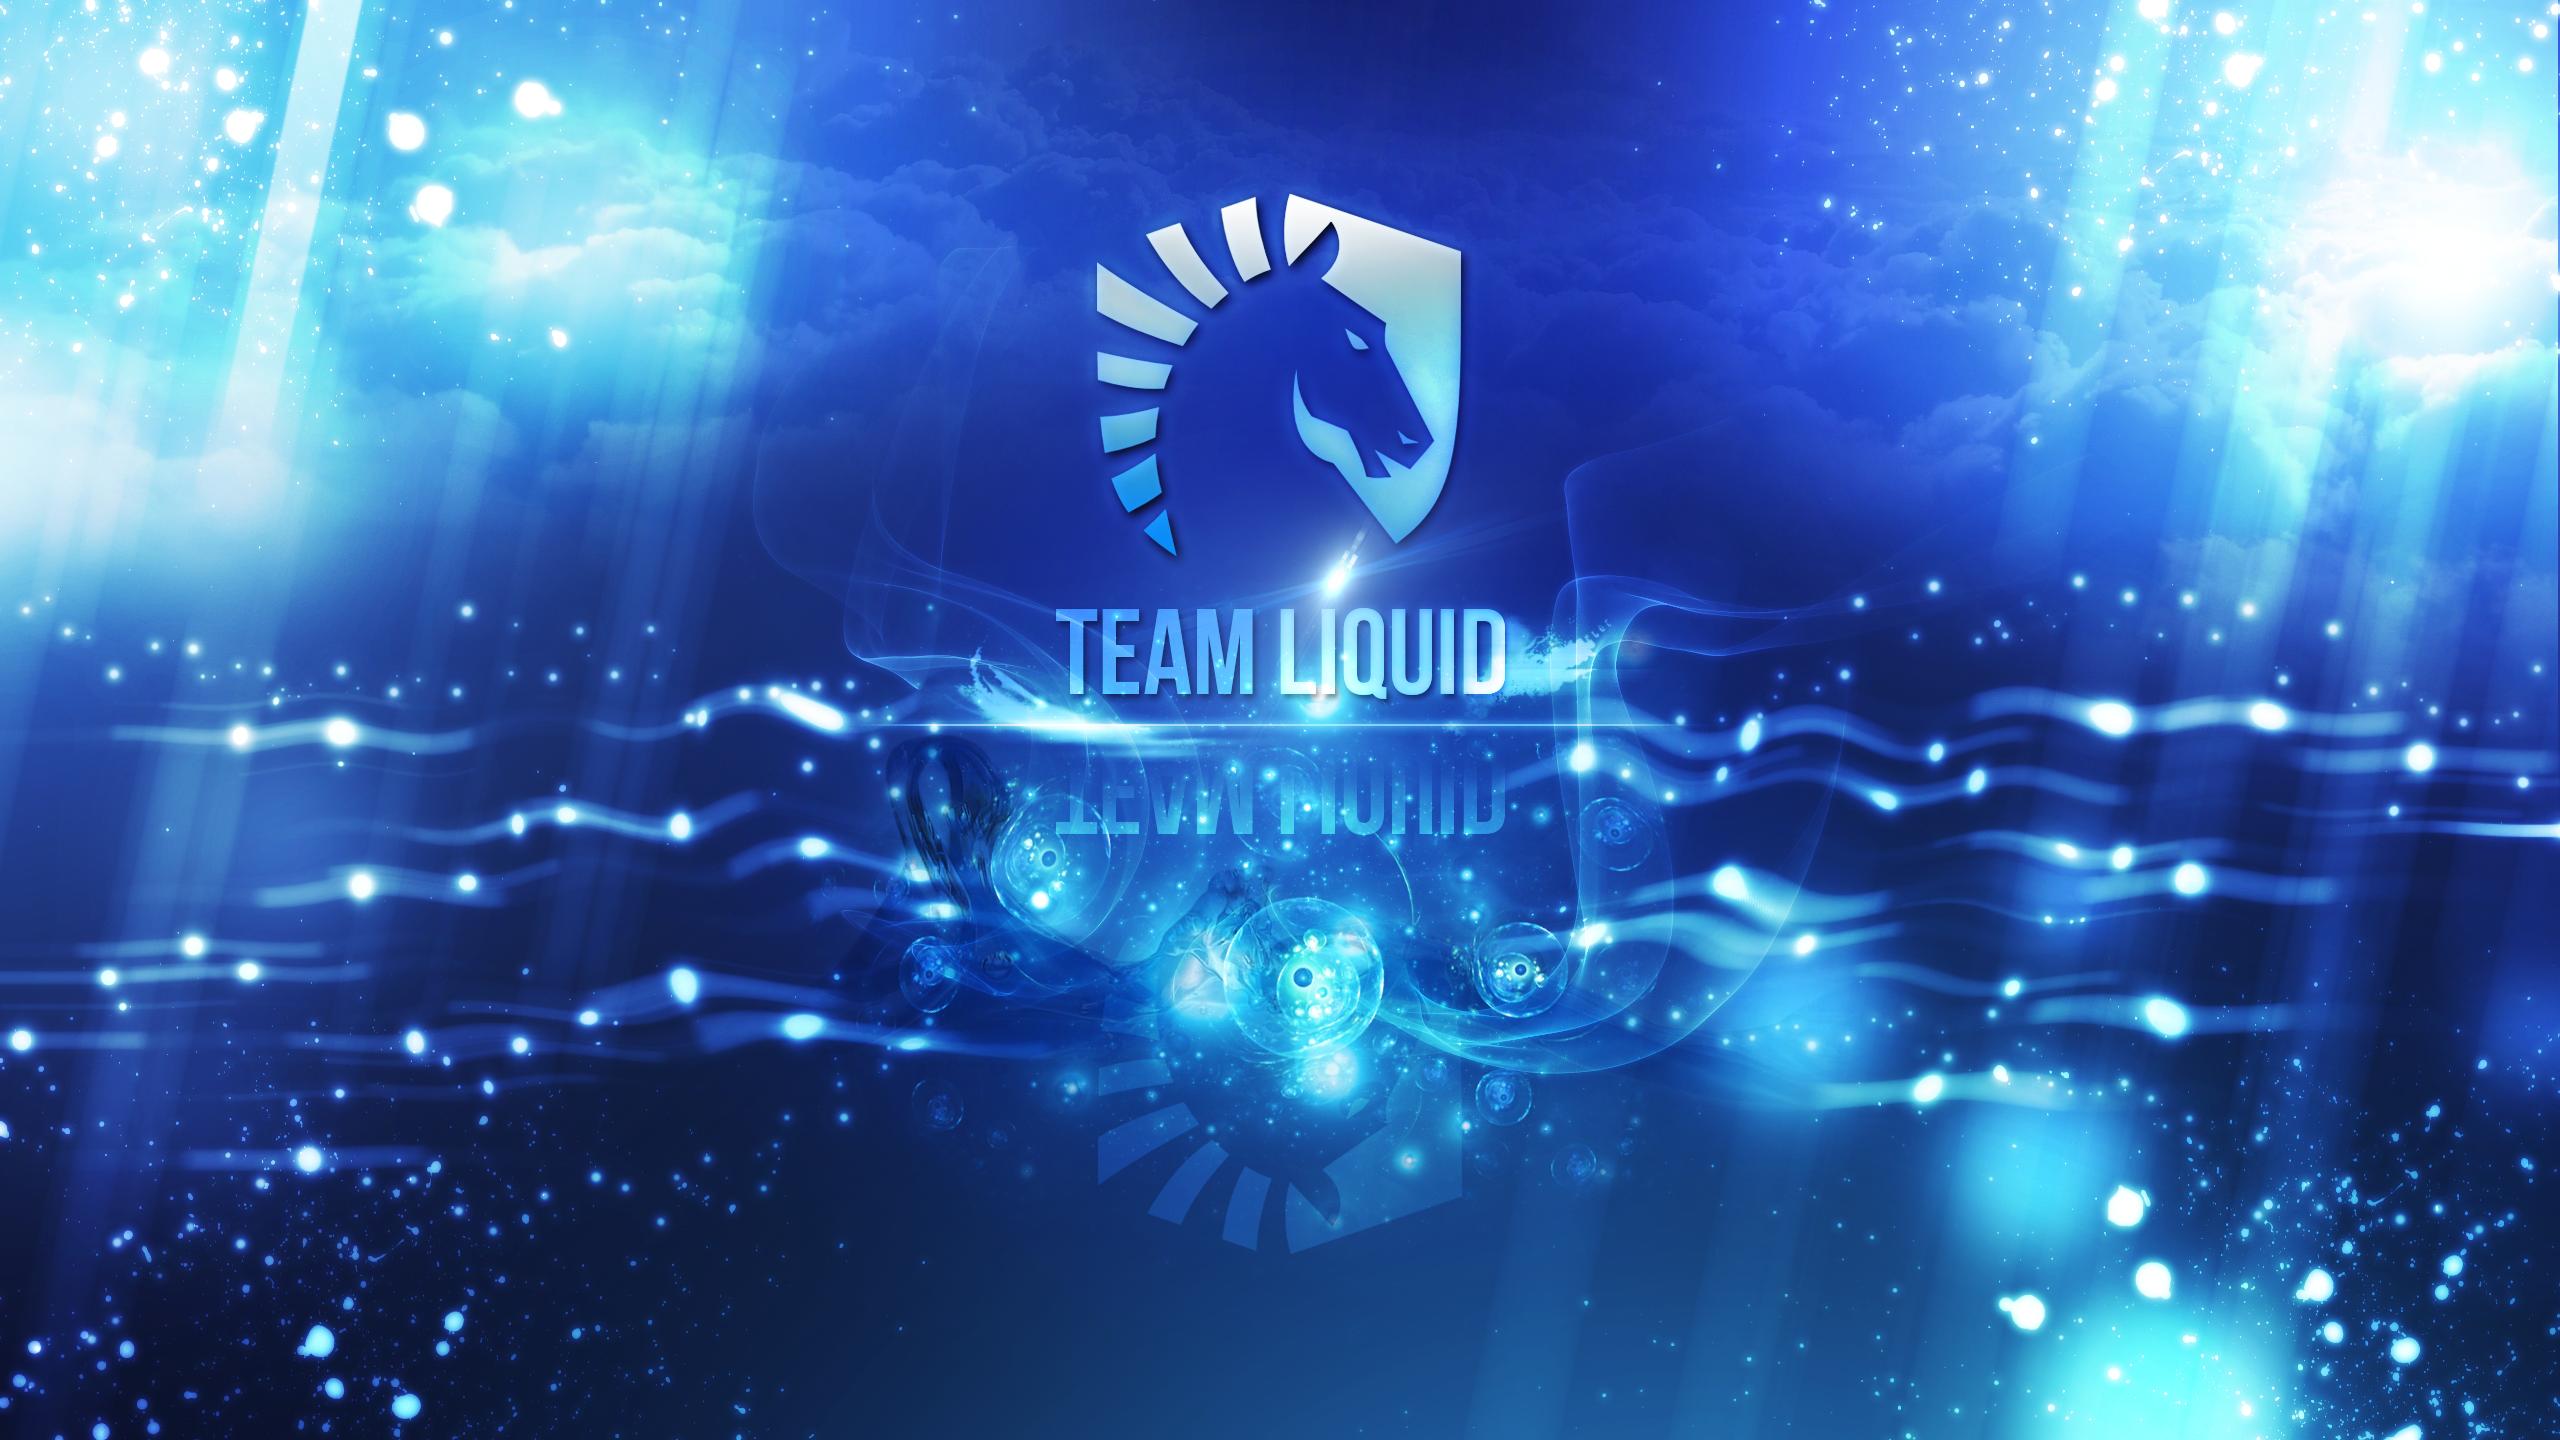 Team Liquid Wallpaper Logo League Of Legends By Aynoe On Deviantart